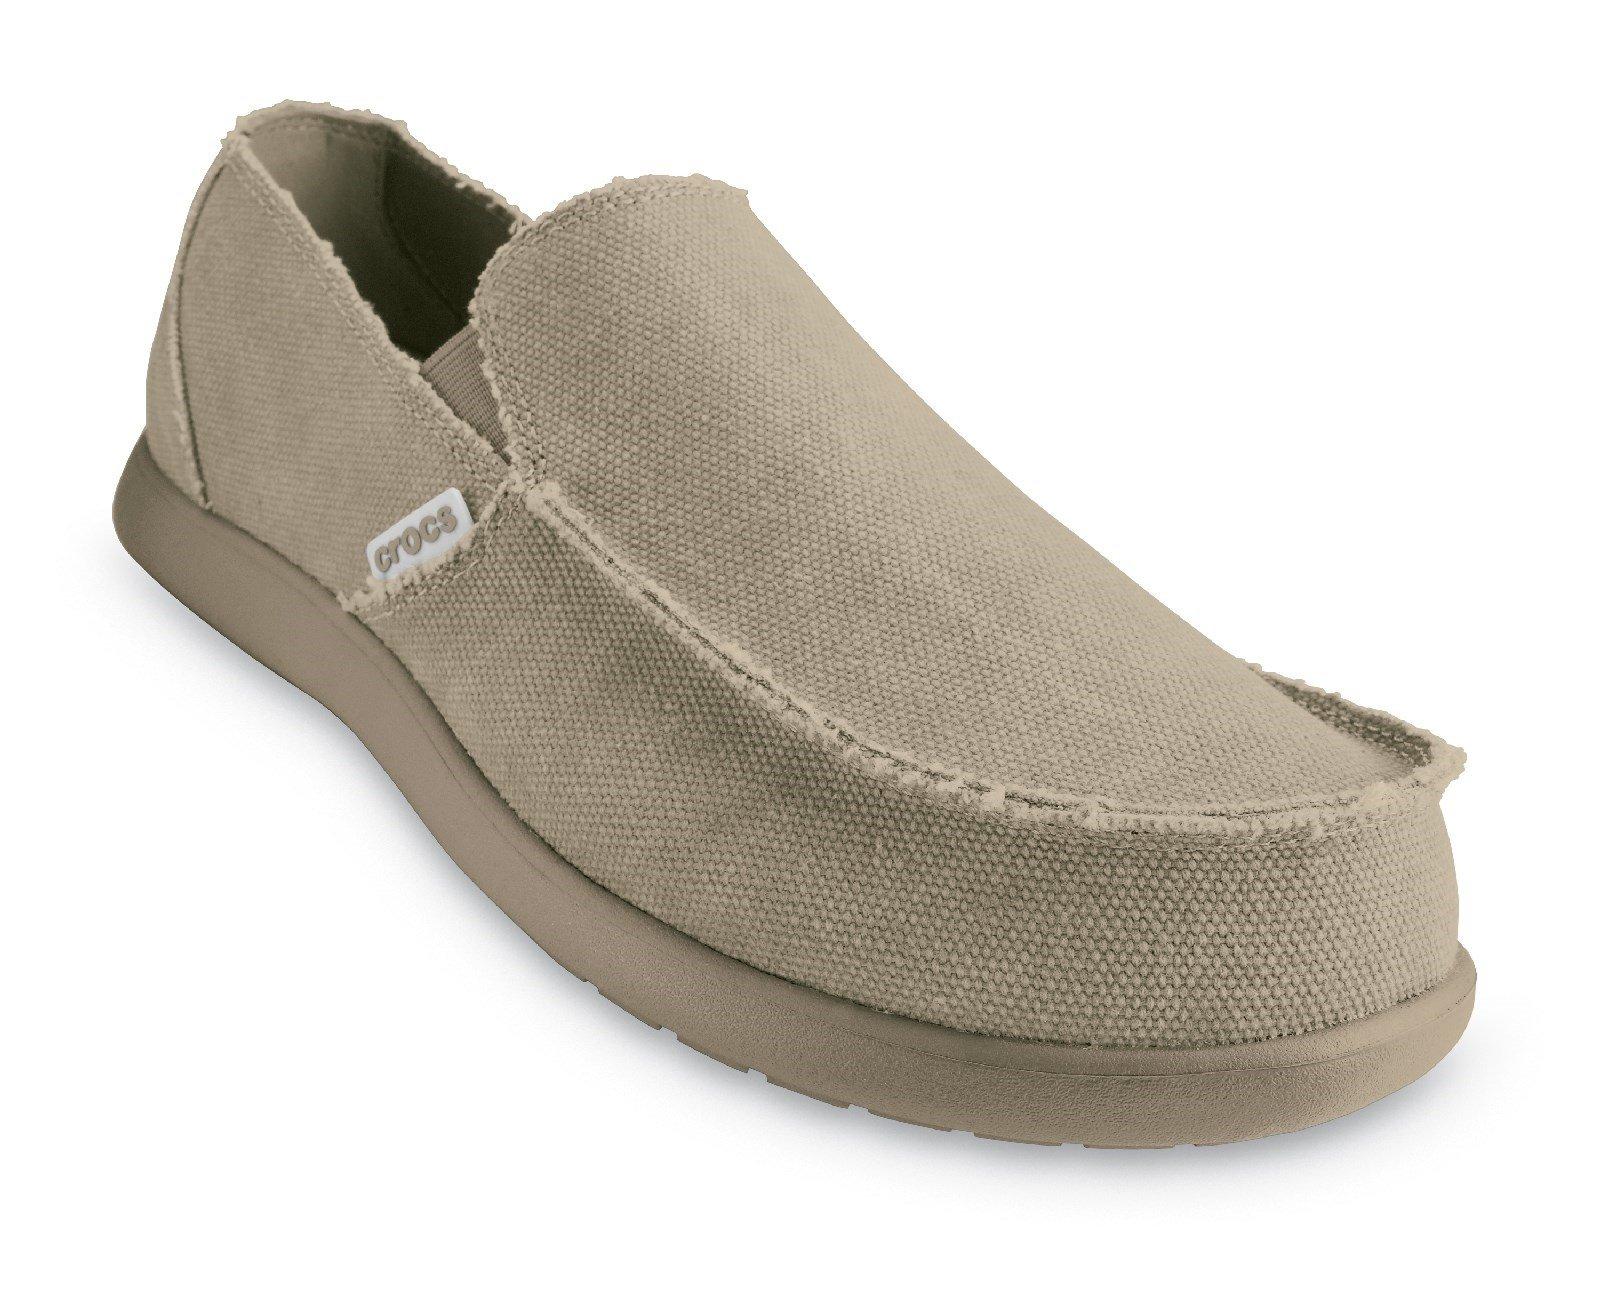 Crocs Men's Santa Cruz Loafer Khaki 30611 - Khaki 6